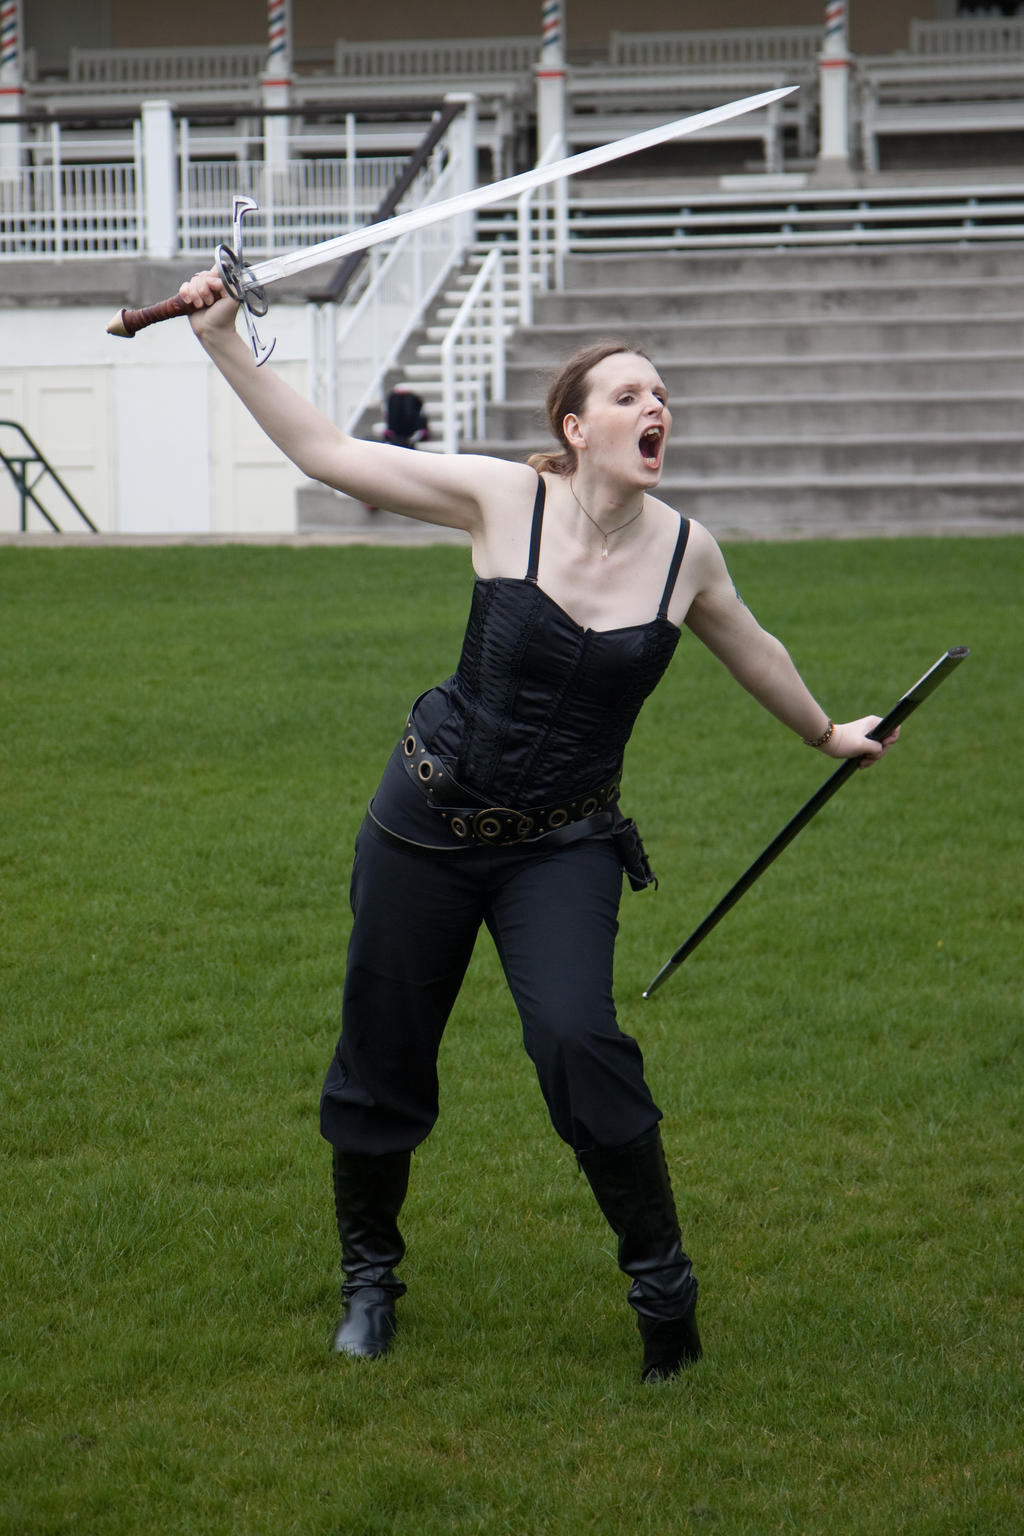 Sword pose stock 15 by Random-Acts-Stock on DeviantArt